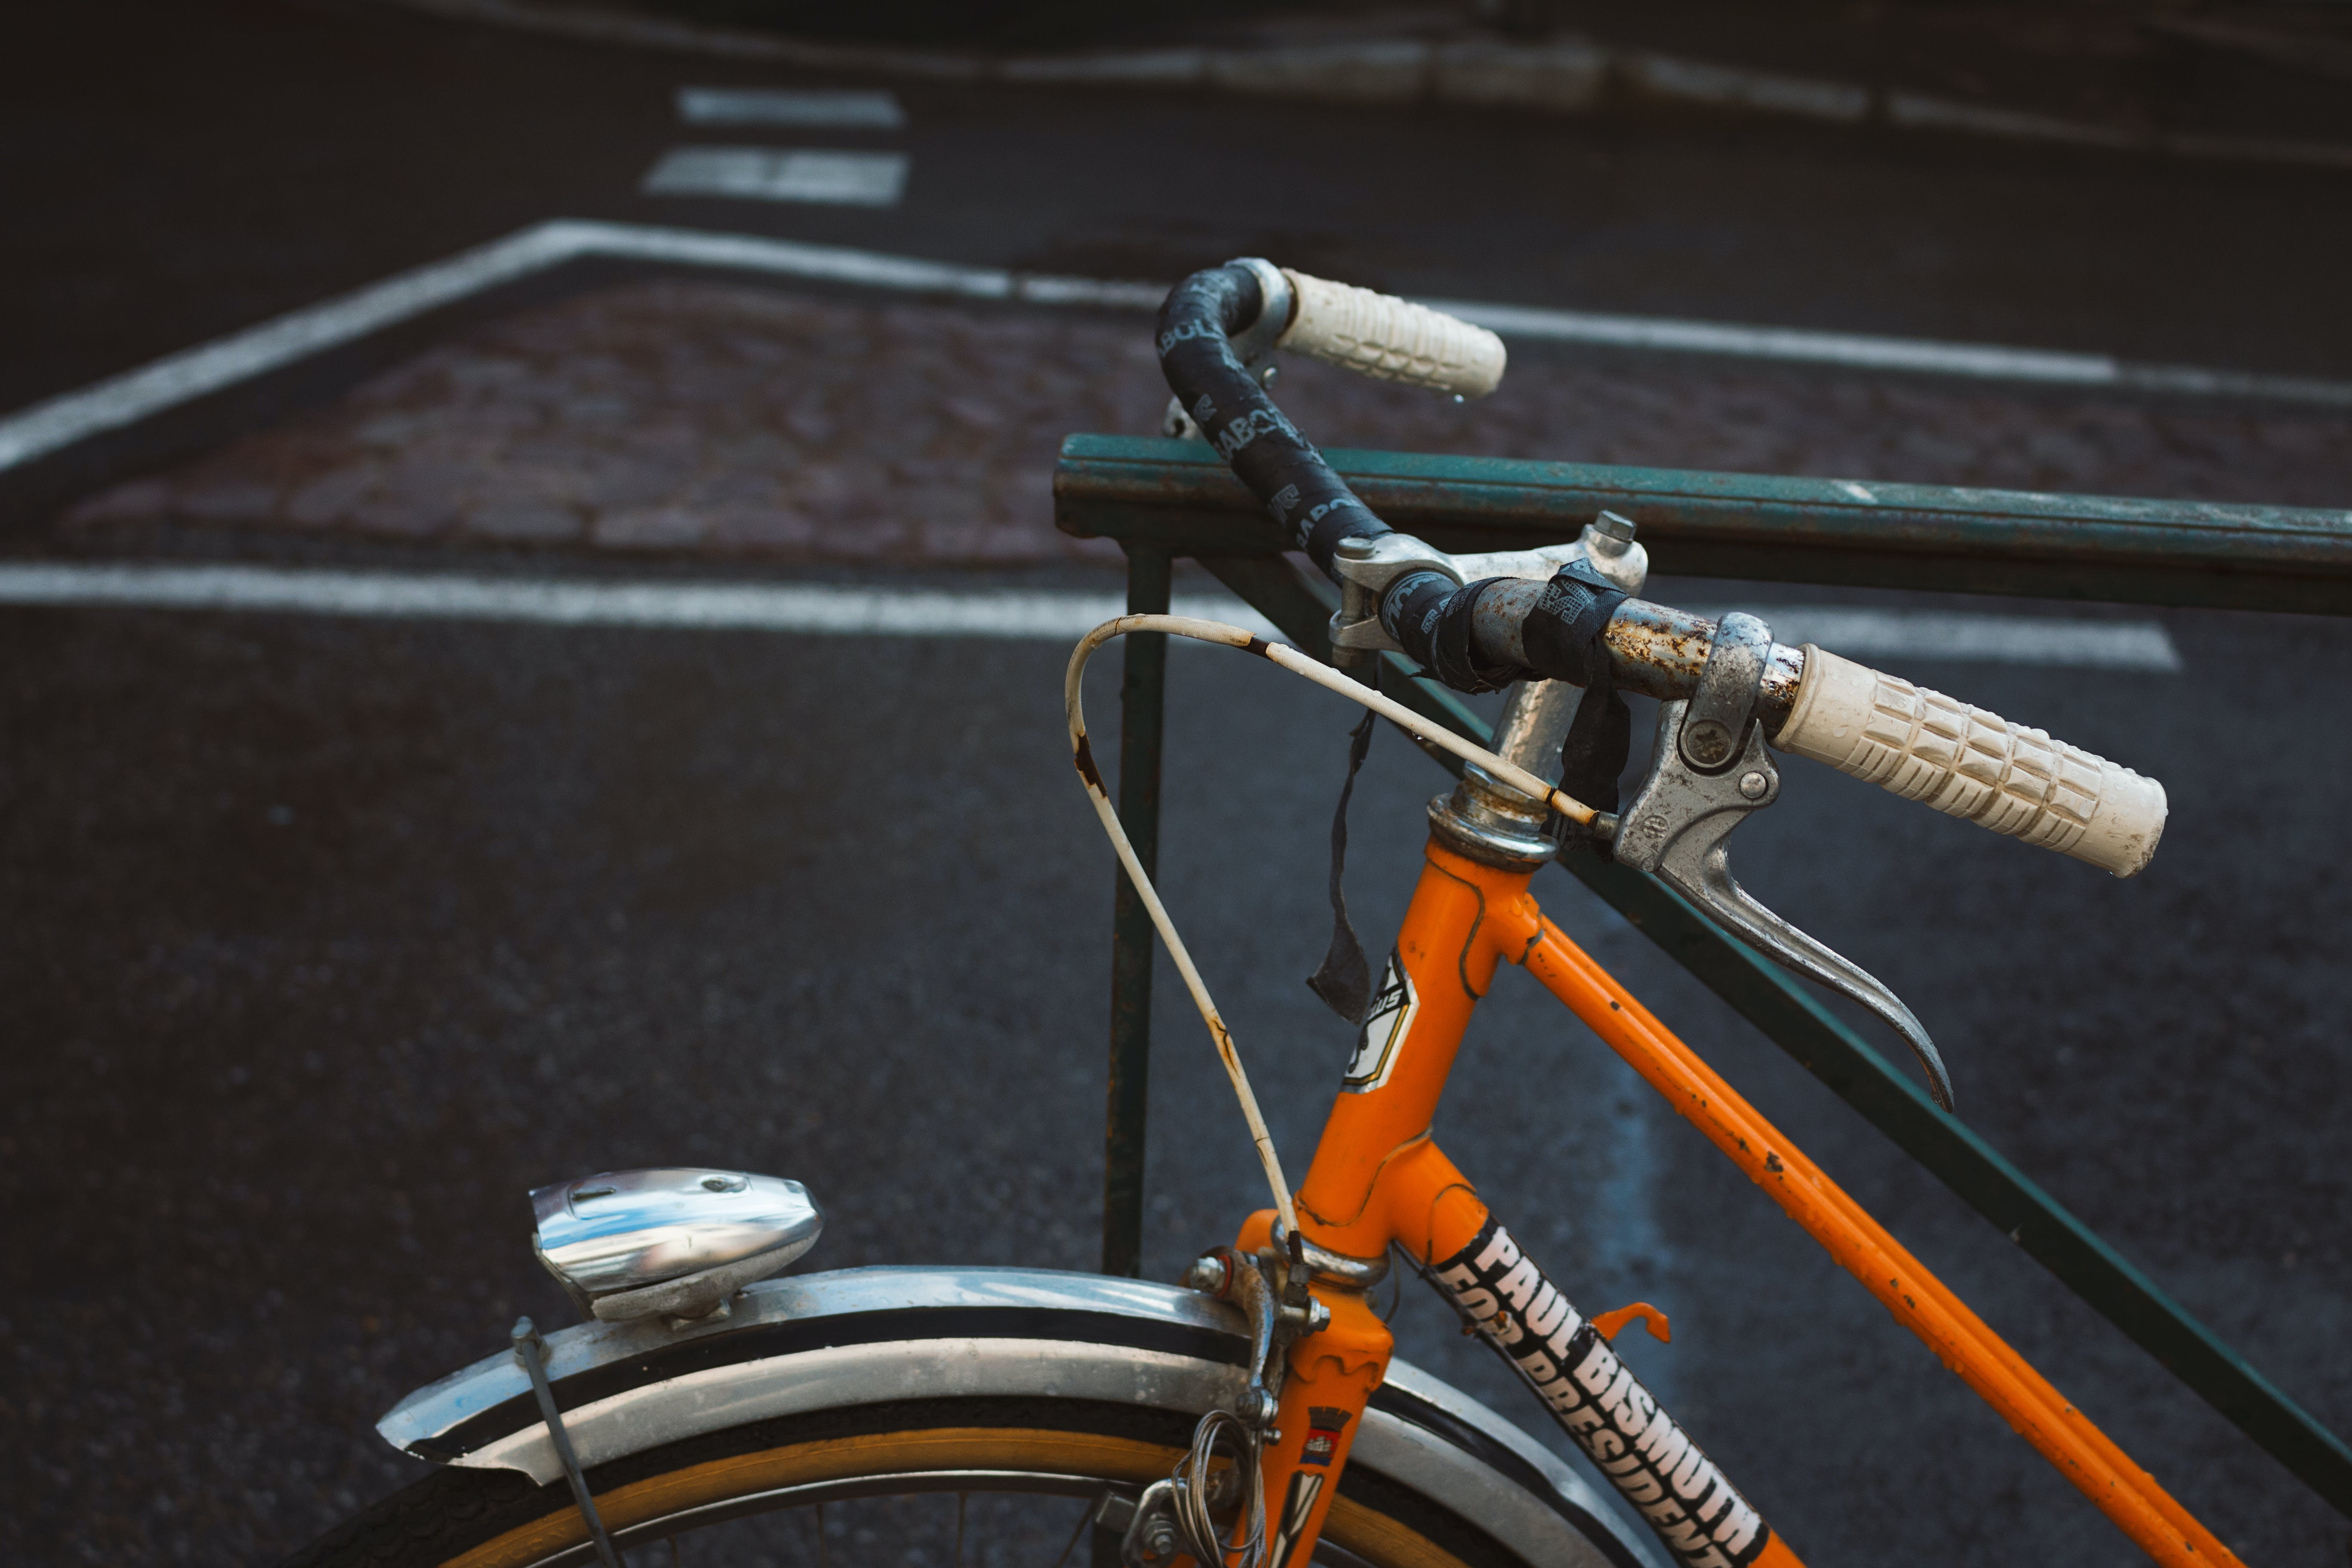 Gratis lagerfoto af asfalt, by, cykel, farve